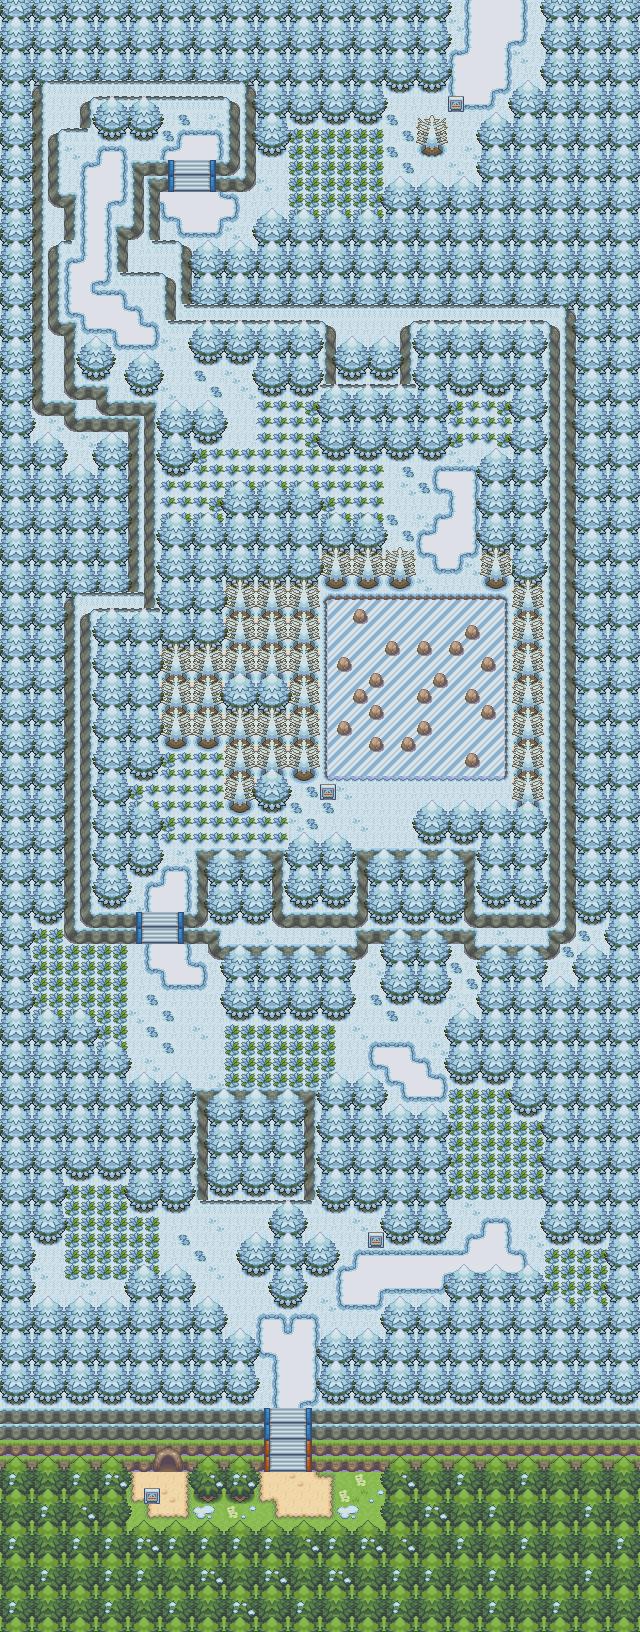 Pokemon light platinum walkthrough route 411